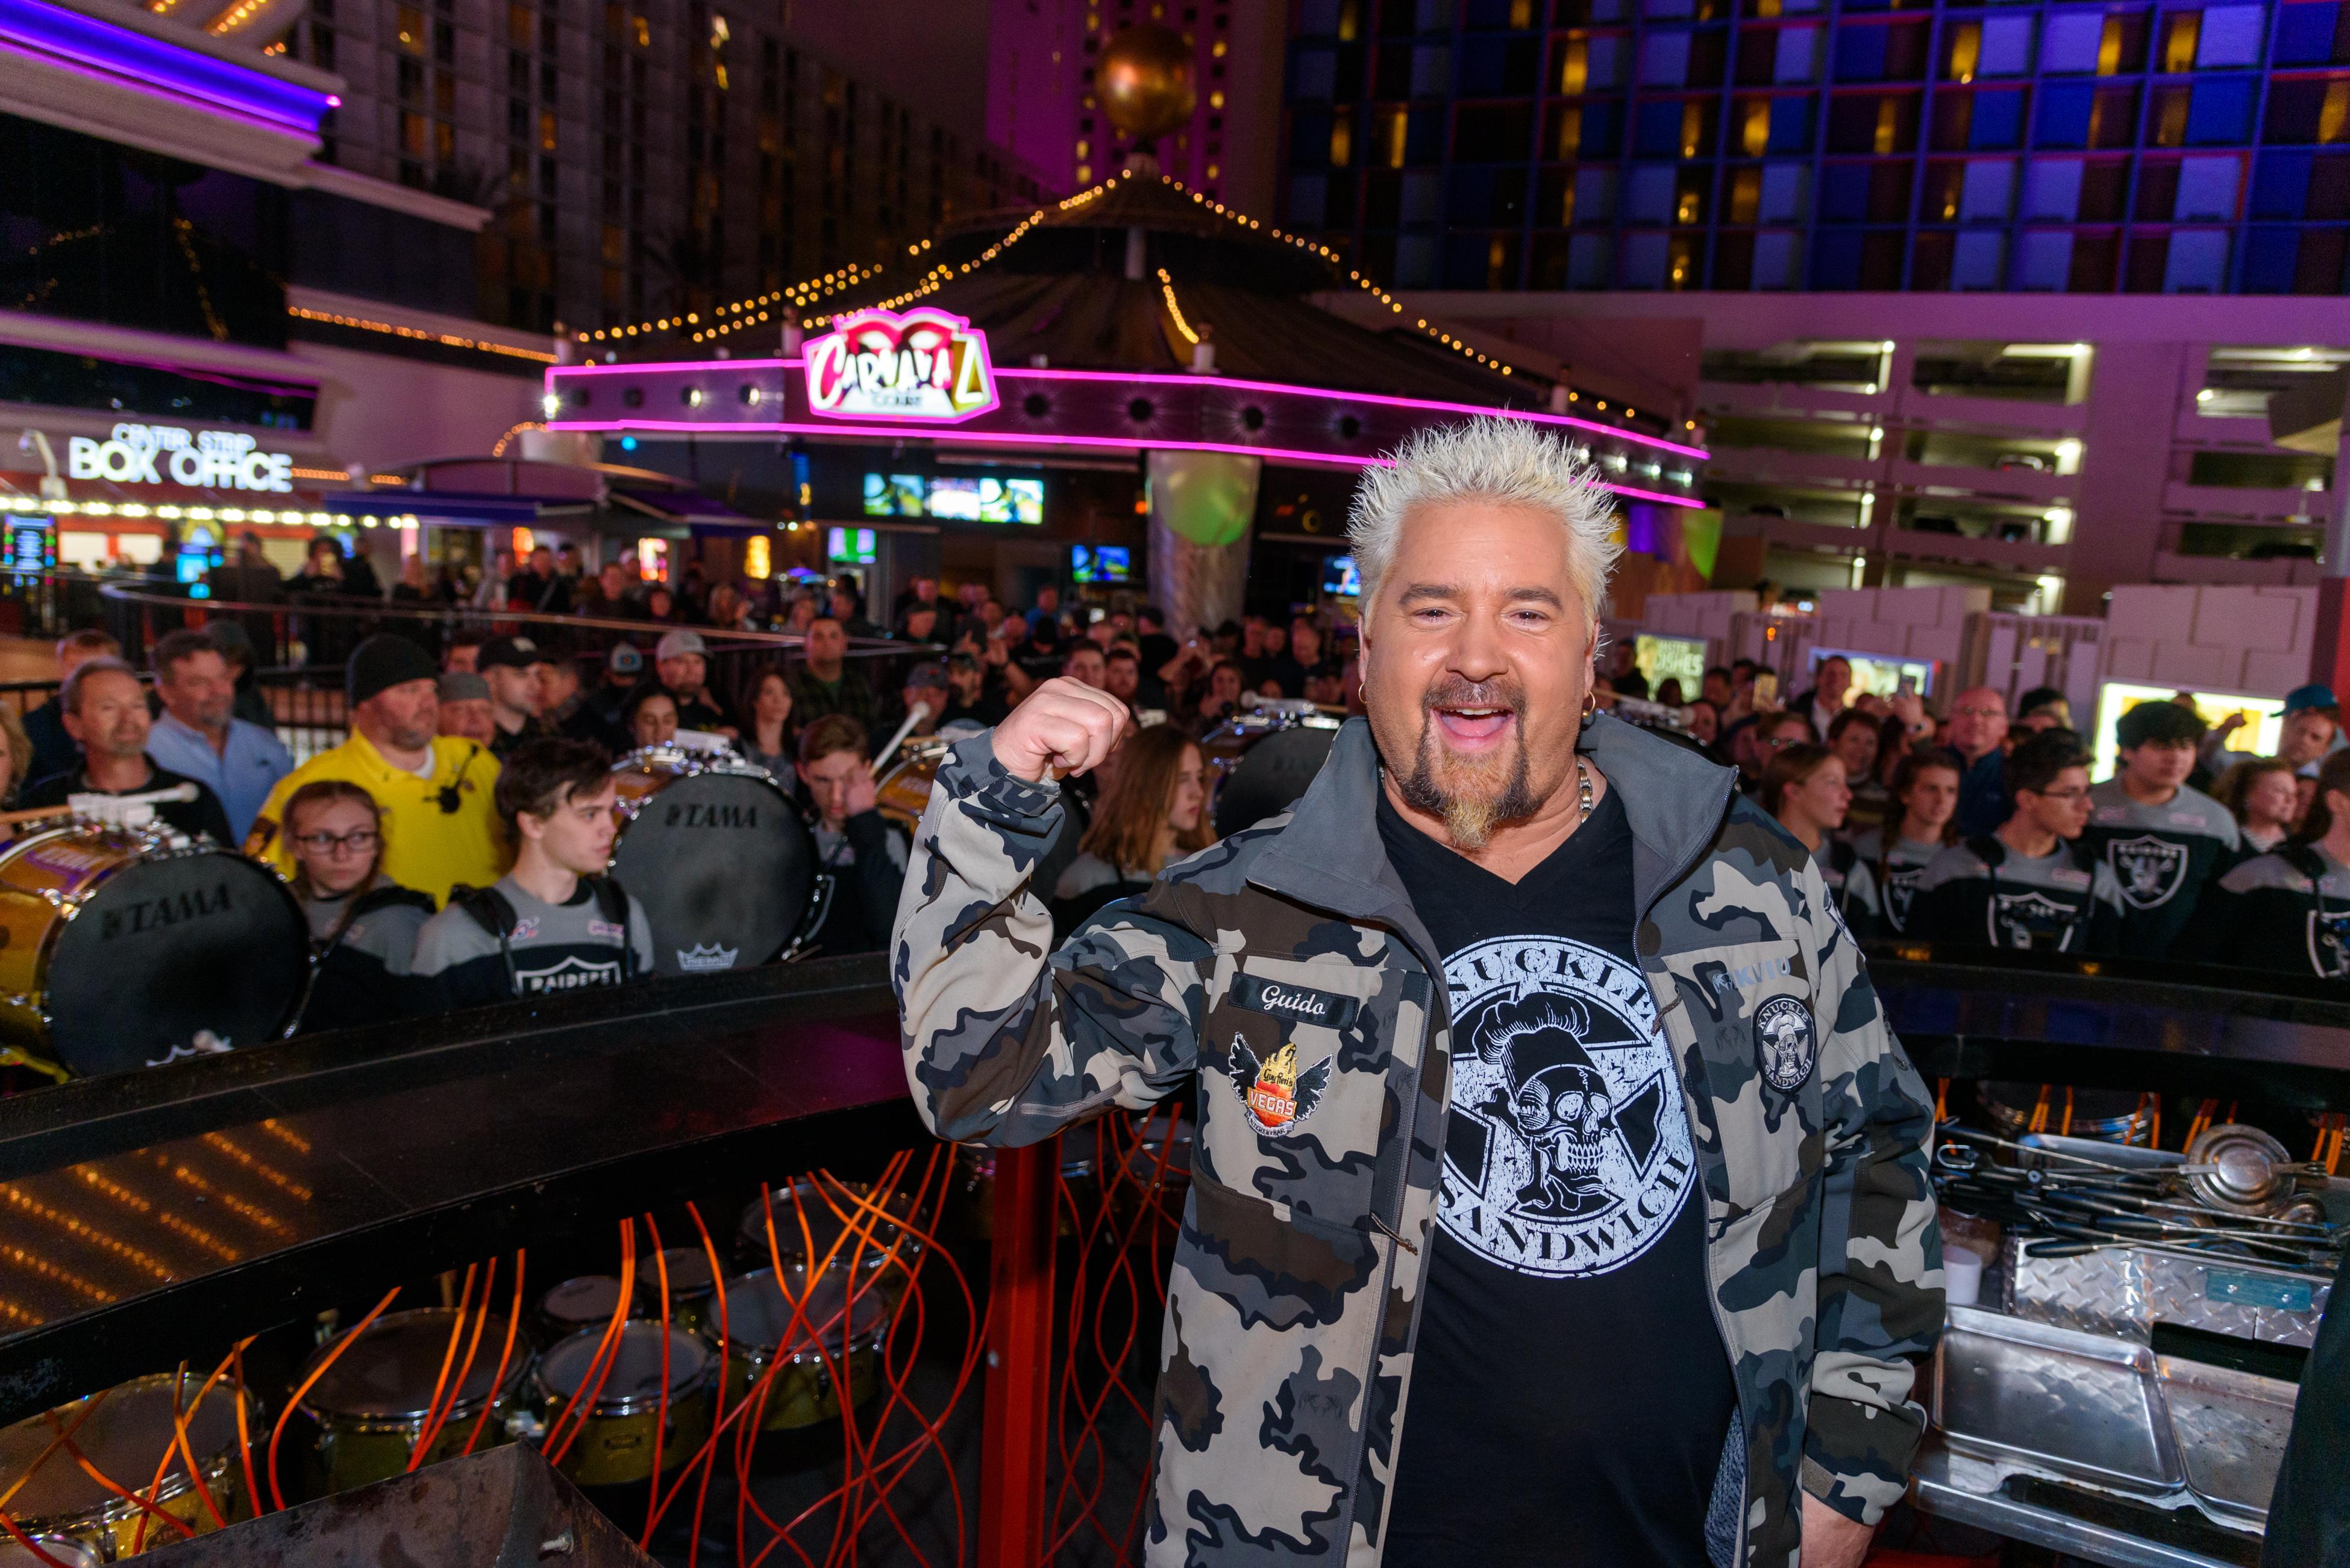 How Guy Fieri Celebrated His Birthday in Las Vegas